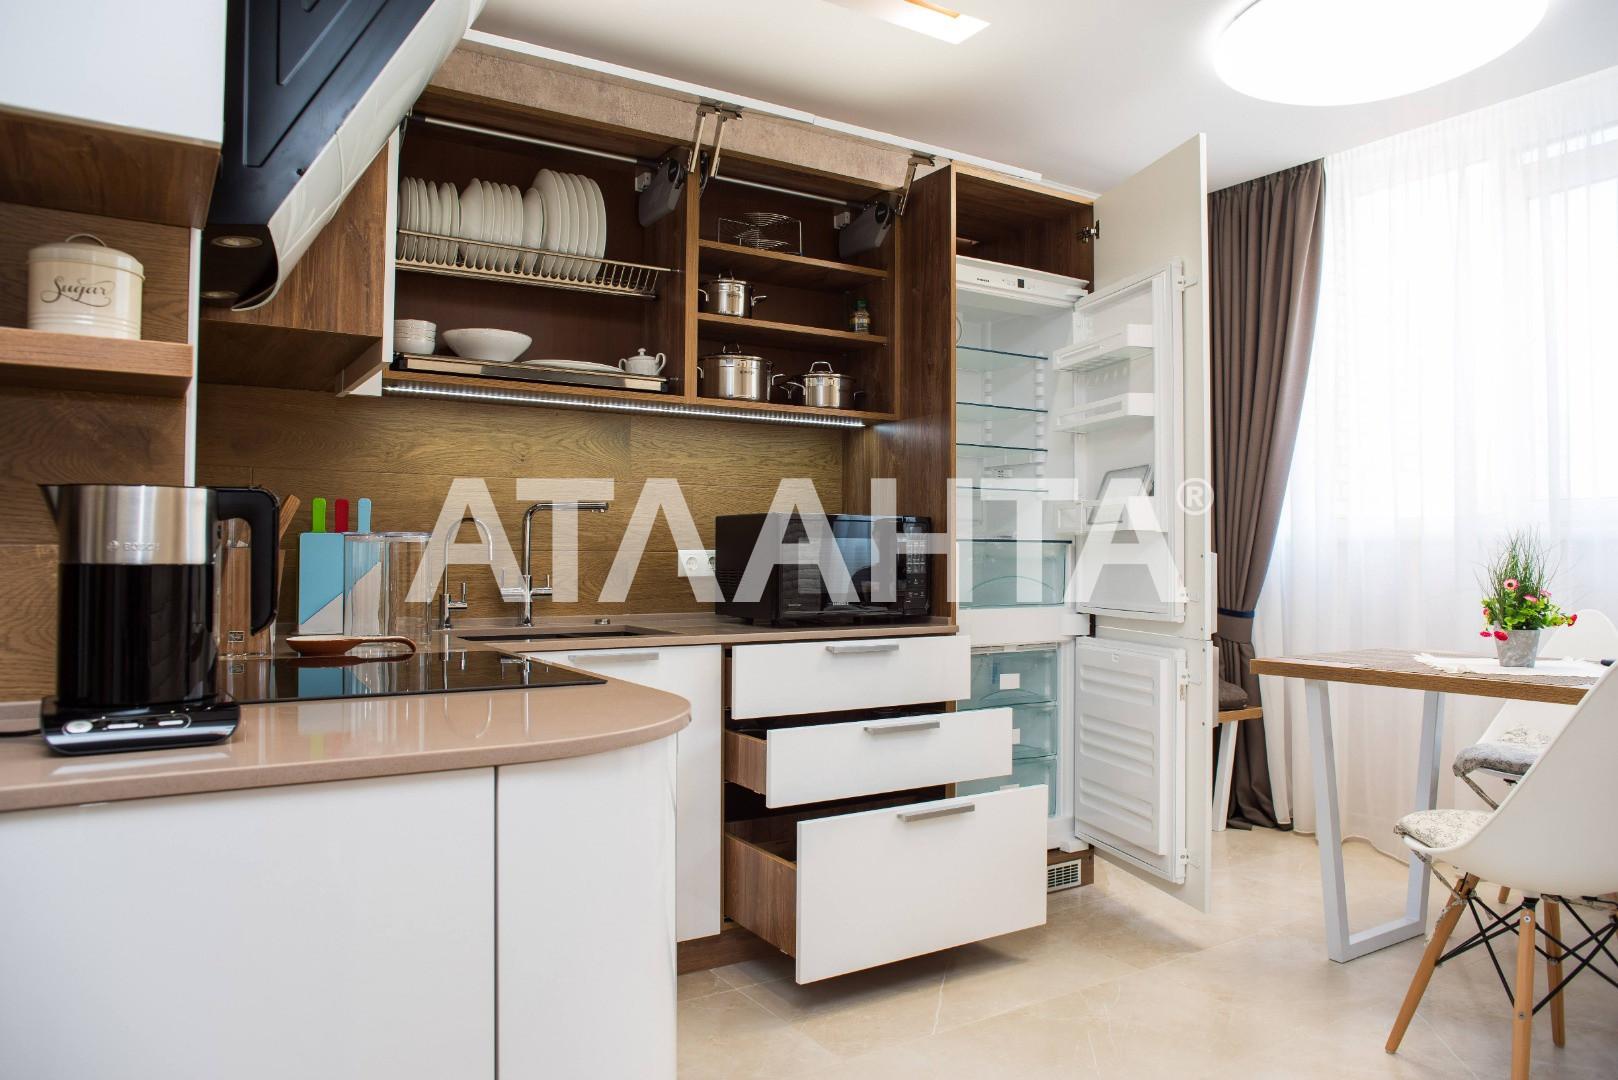 Продается 1-комнатная Квартира на ул. Балковская (Фрунзе) — 50 000 у.е. (фото №4)